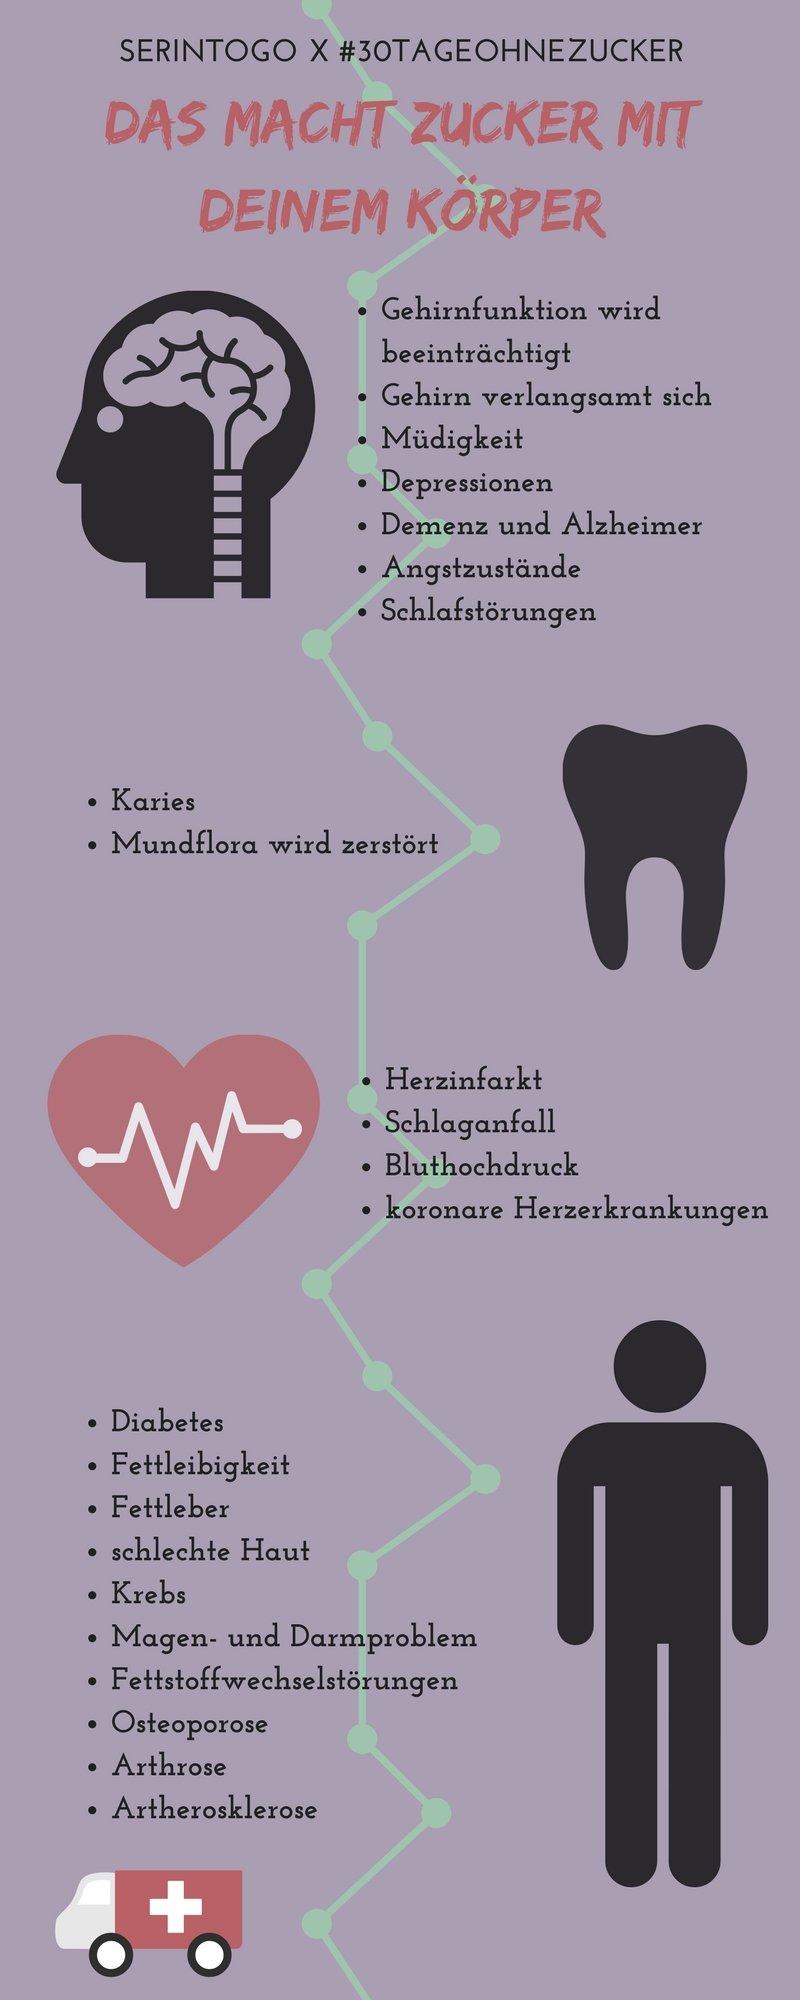 zuckerkrankheiten